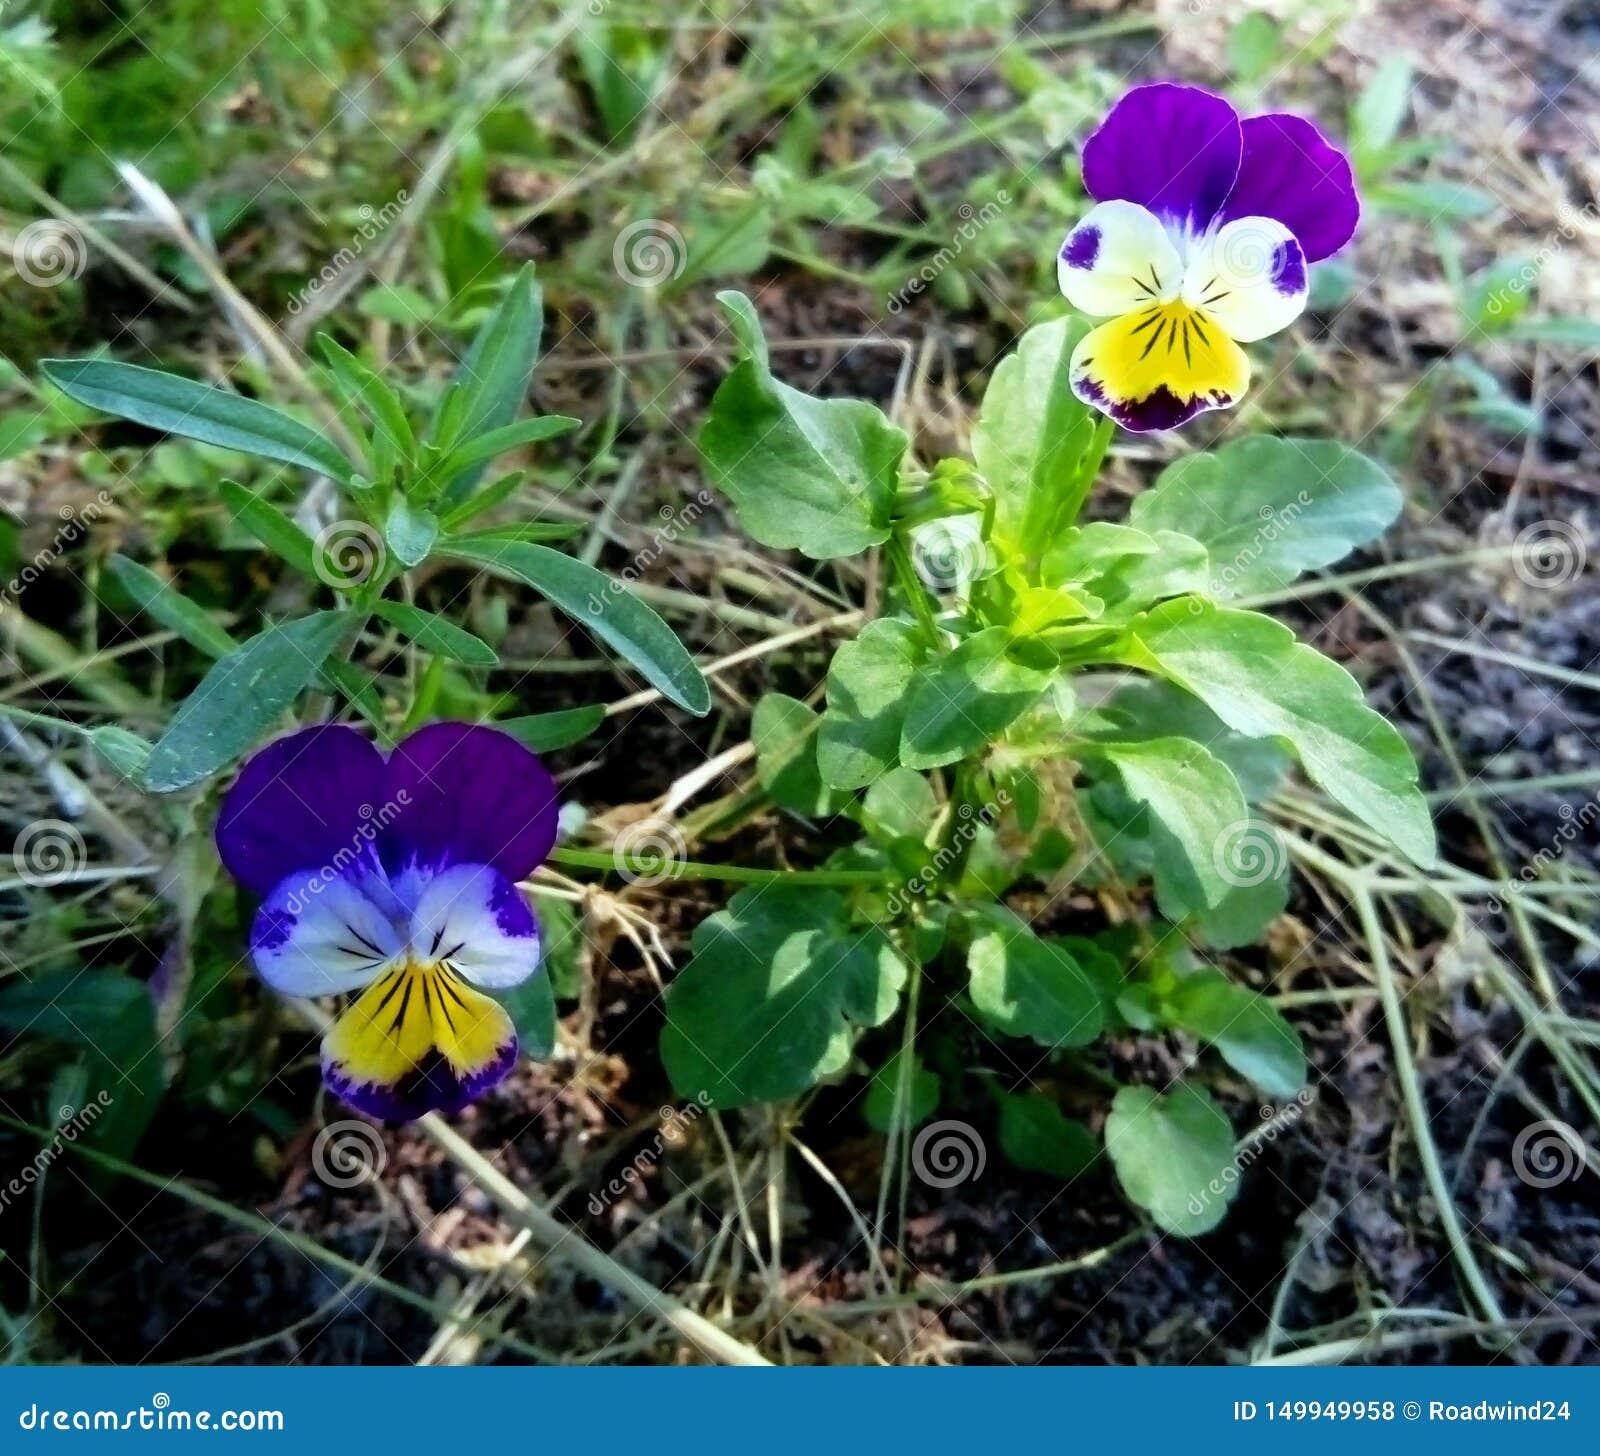 Viola tricolor tiny flowers